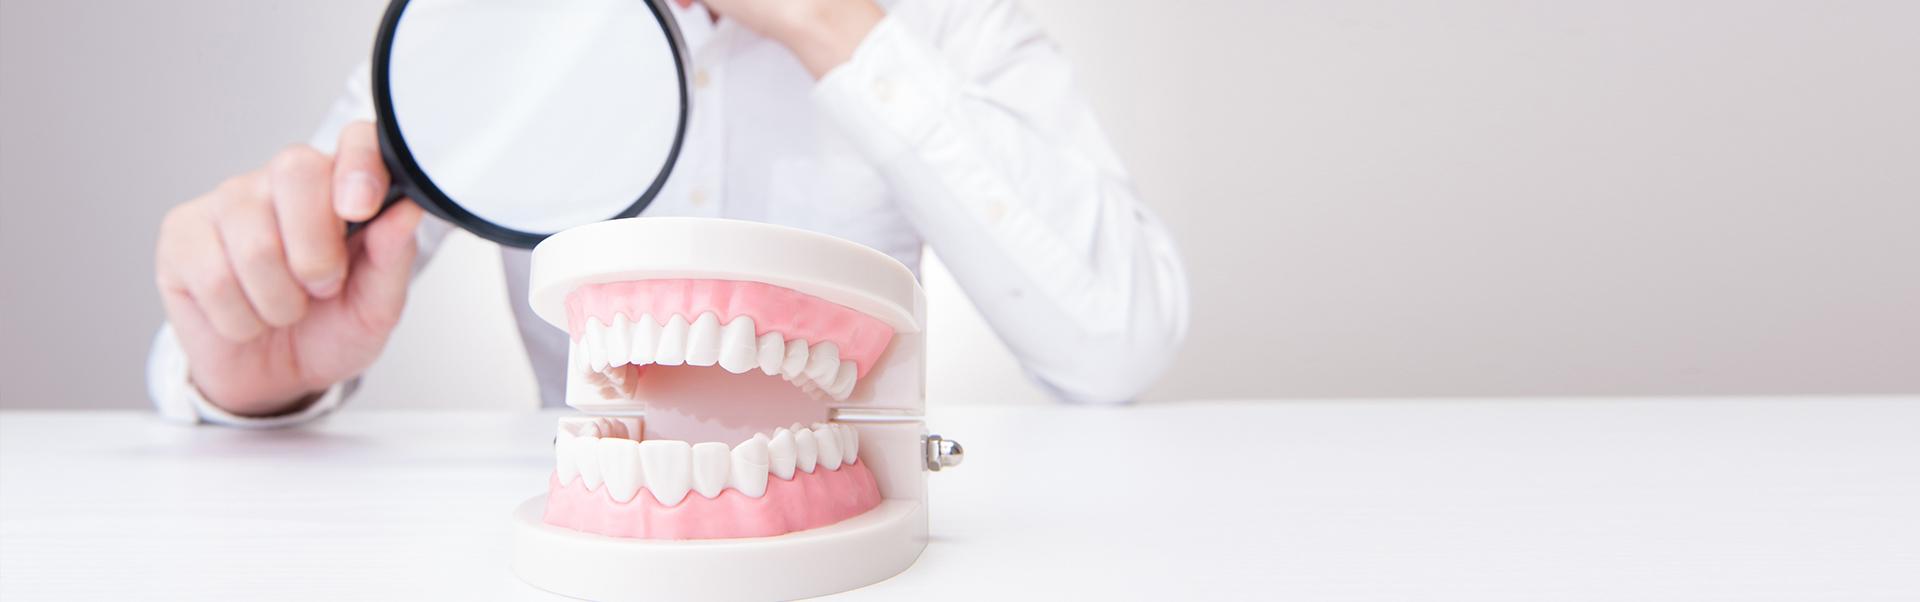 Mutuelle dentaire sans plafond